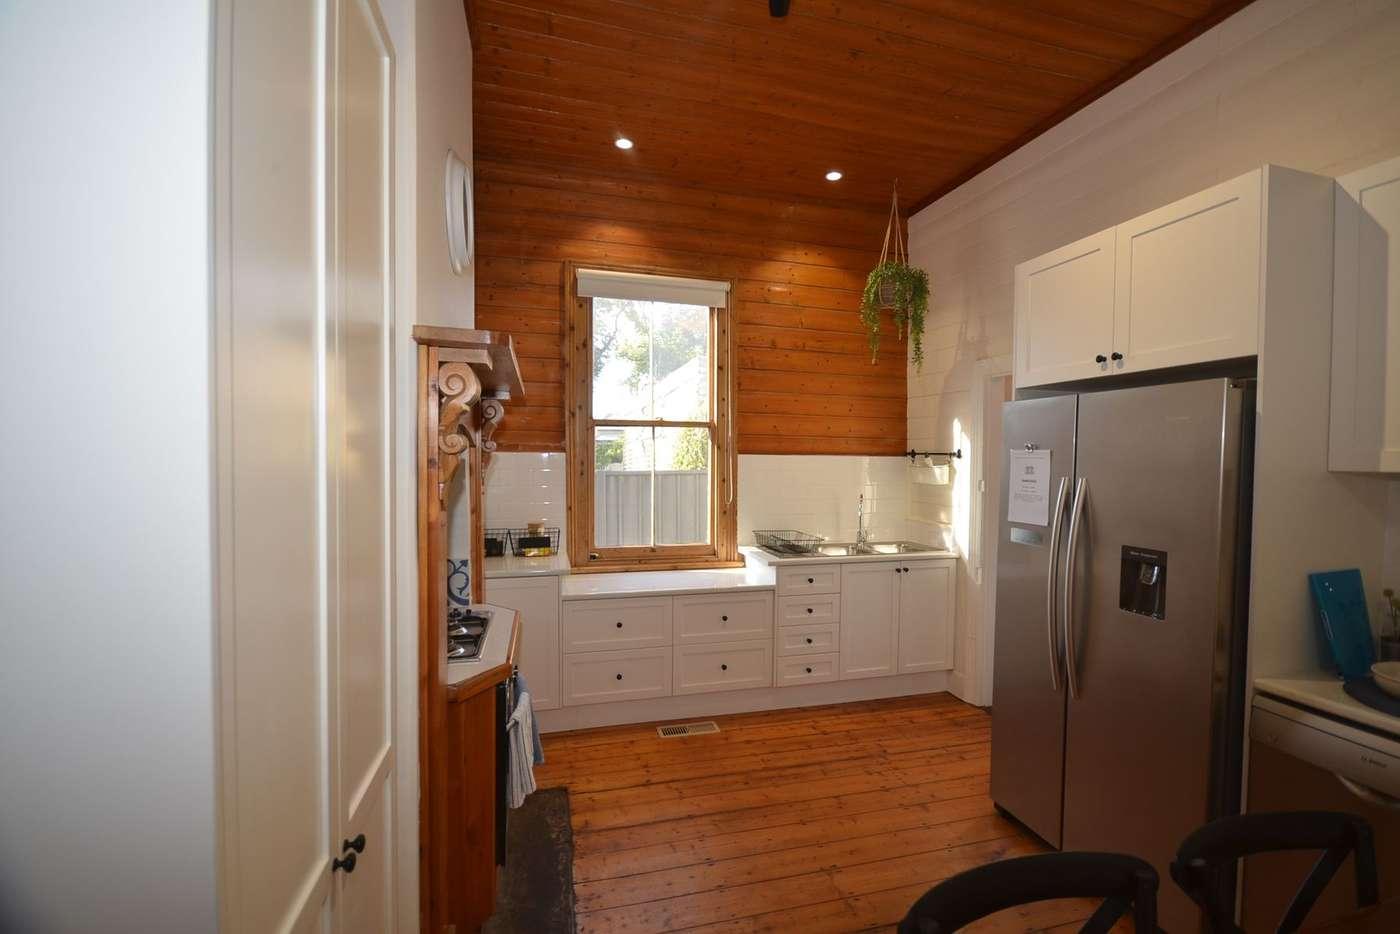 Seventh view of Homely house listing, 81 Baxter Street, Bendigo VIC 3550